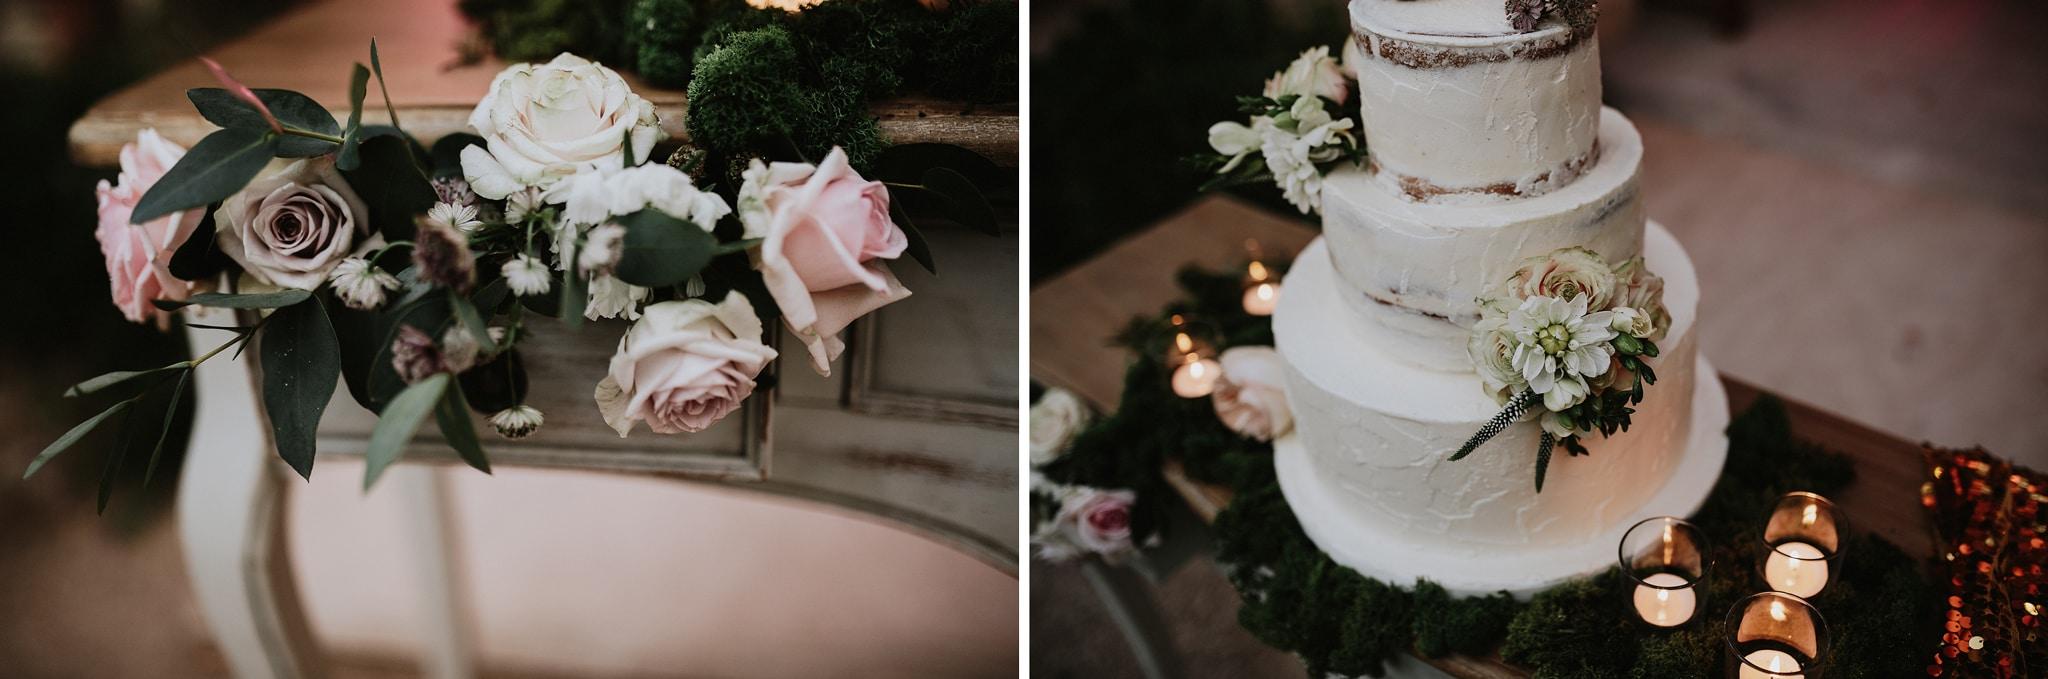 fotografo-bodas-altea-89